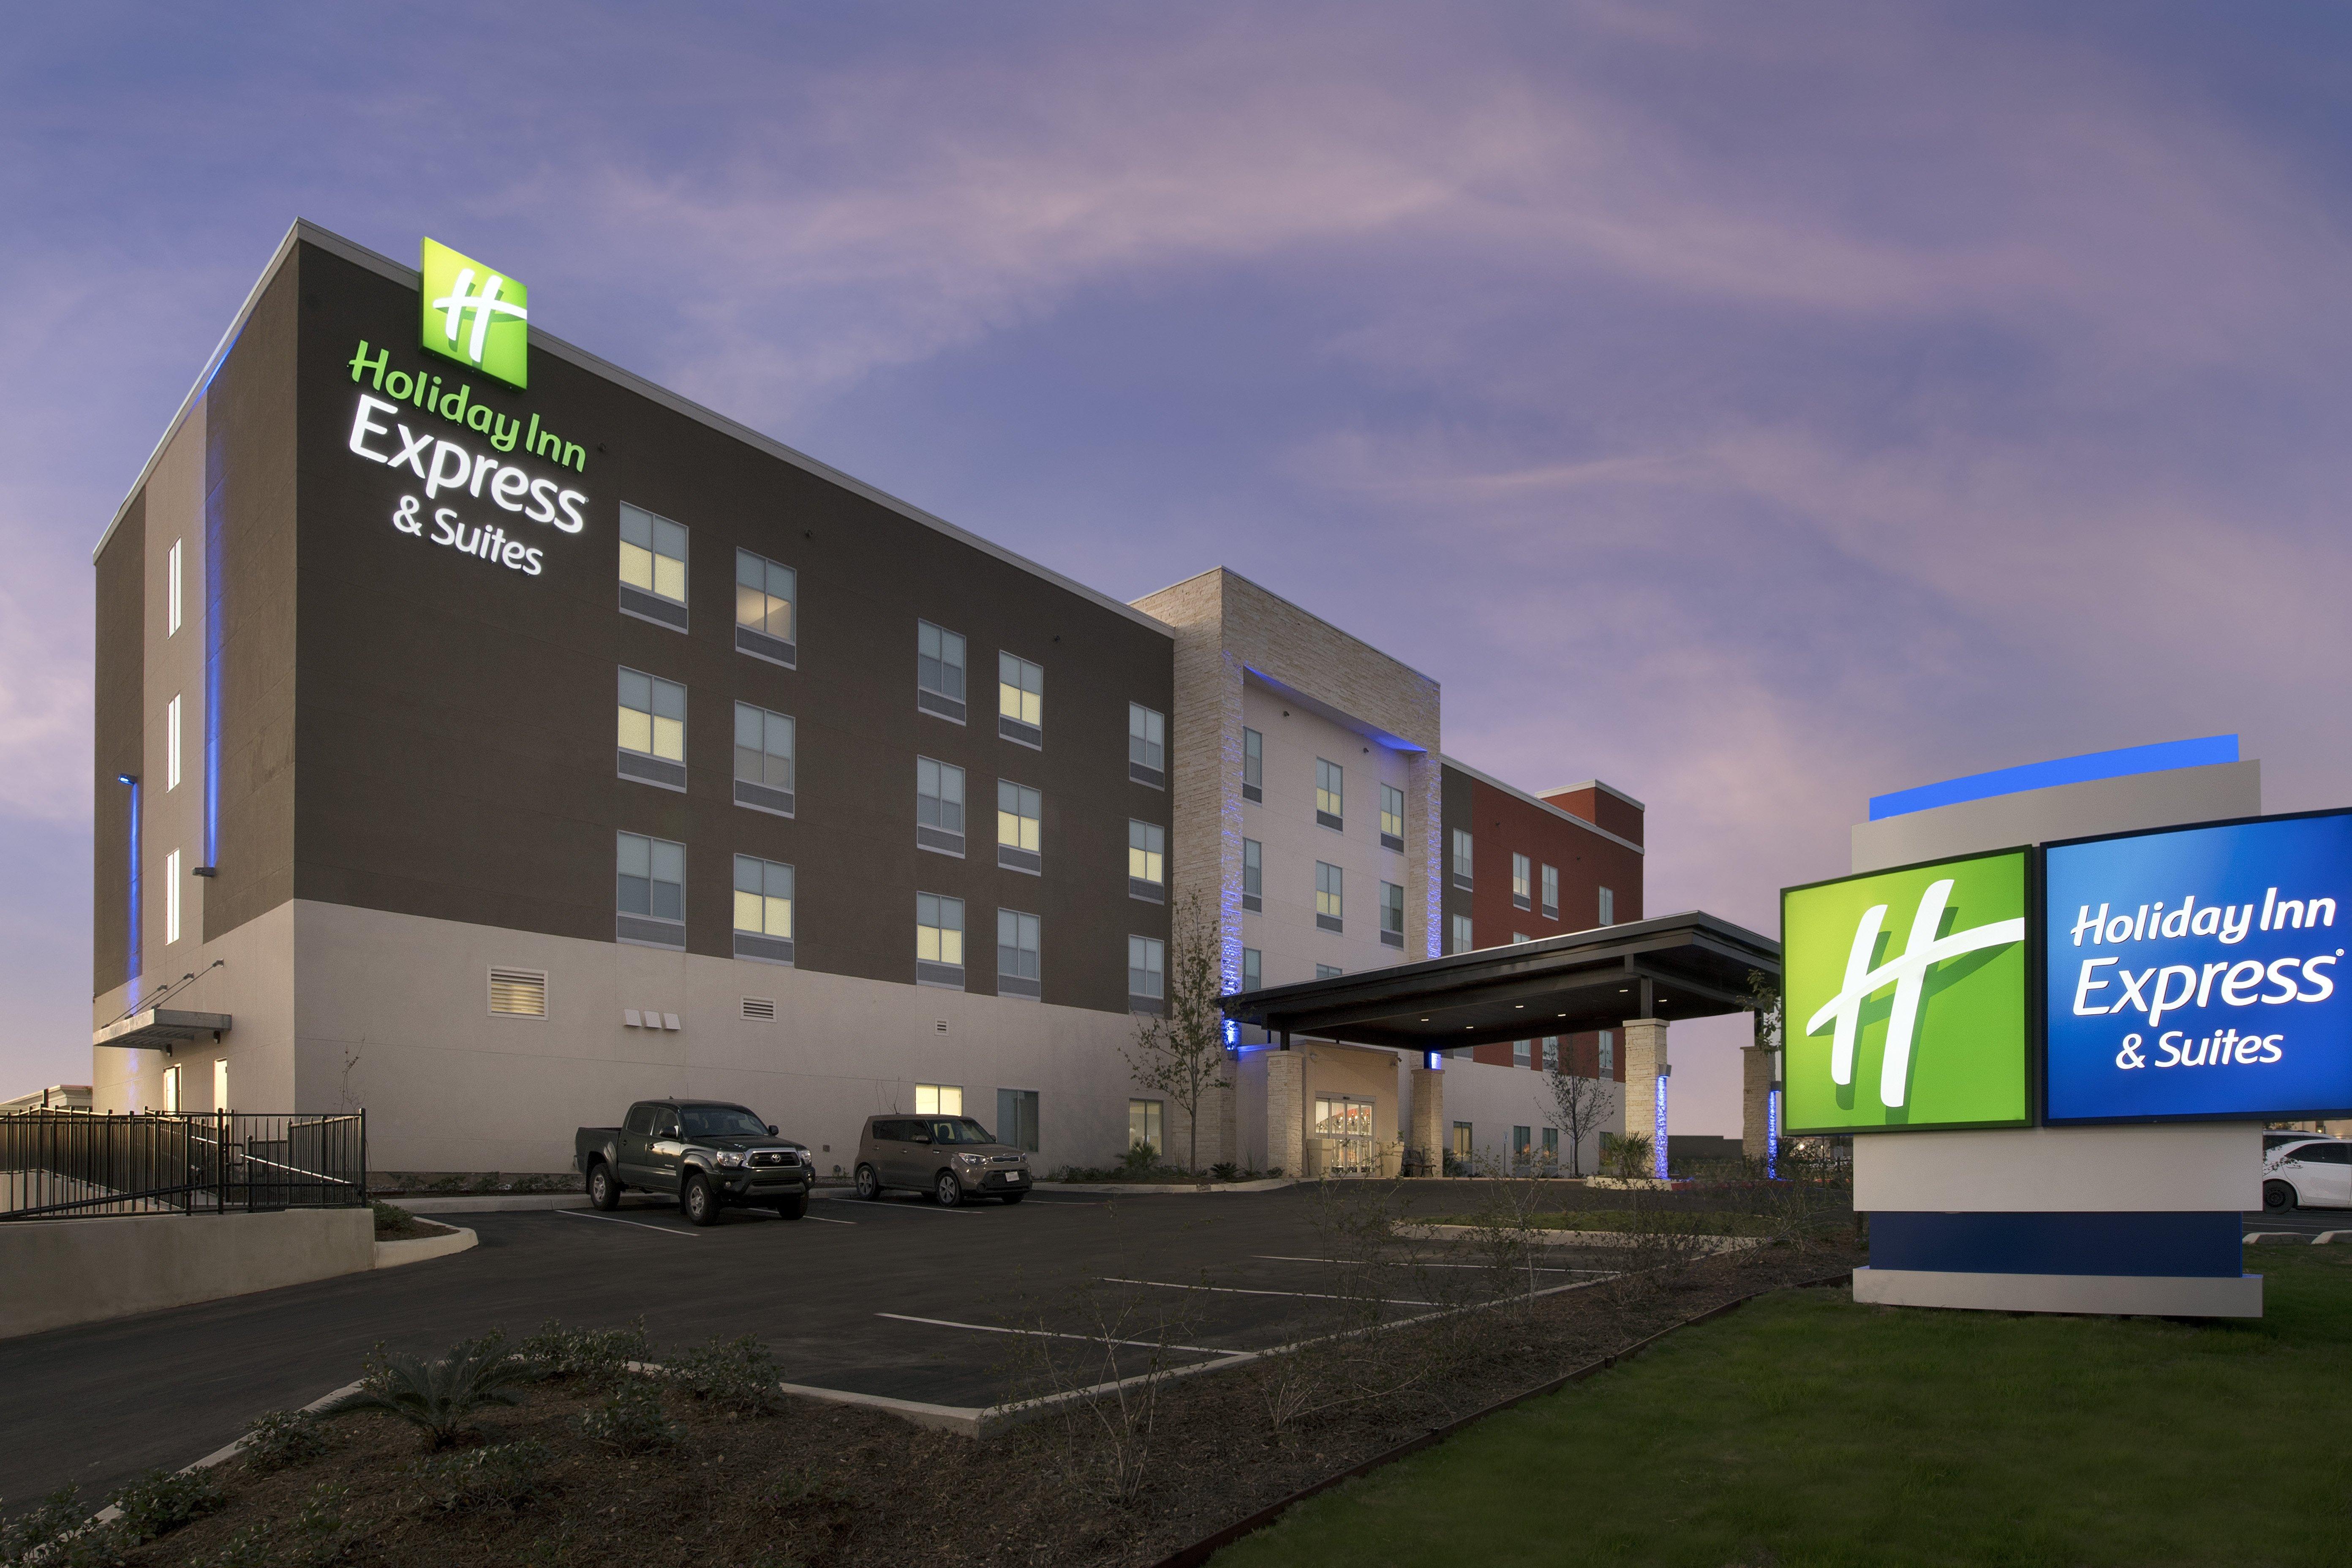 Holiday Inn Express/Suites Windcrest